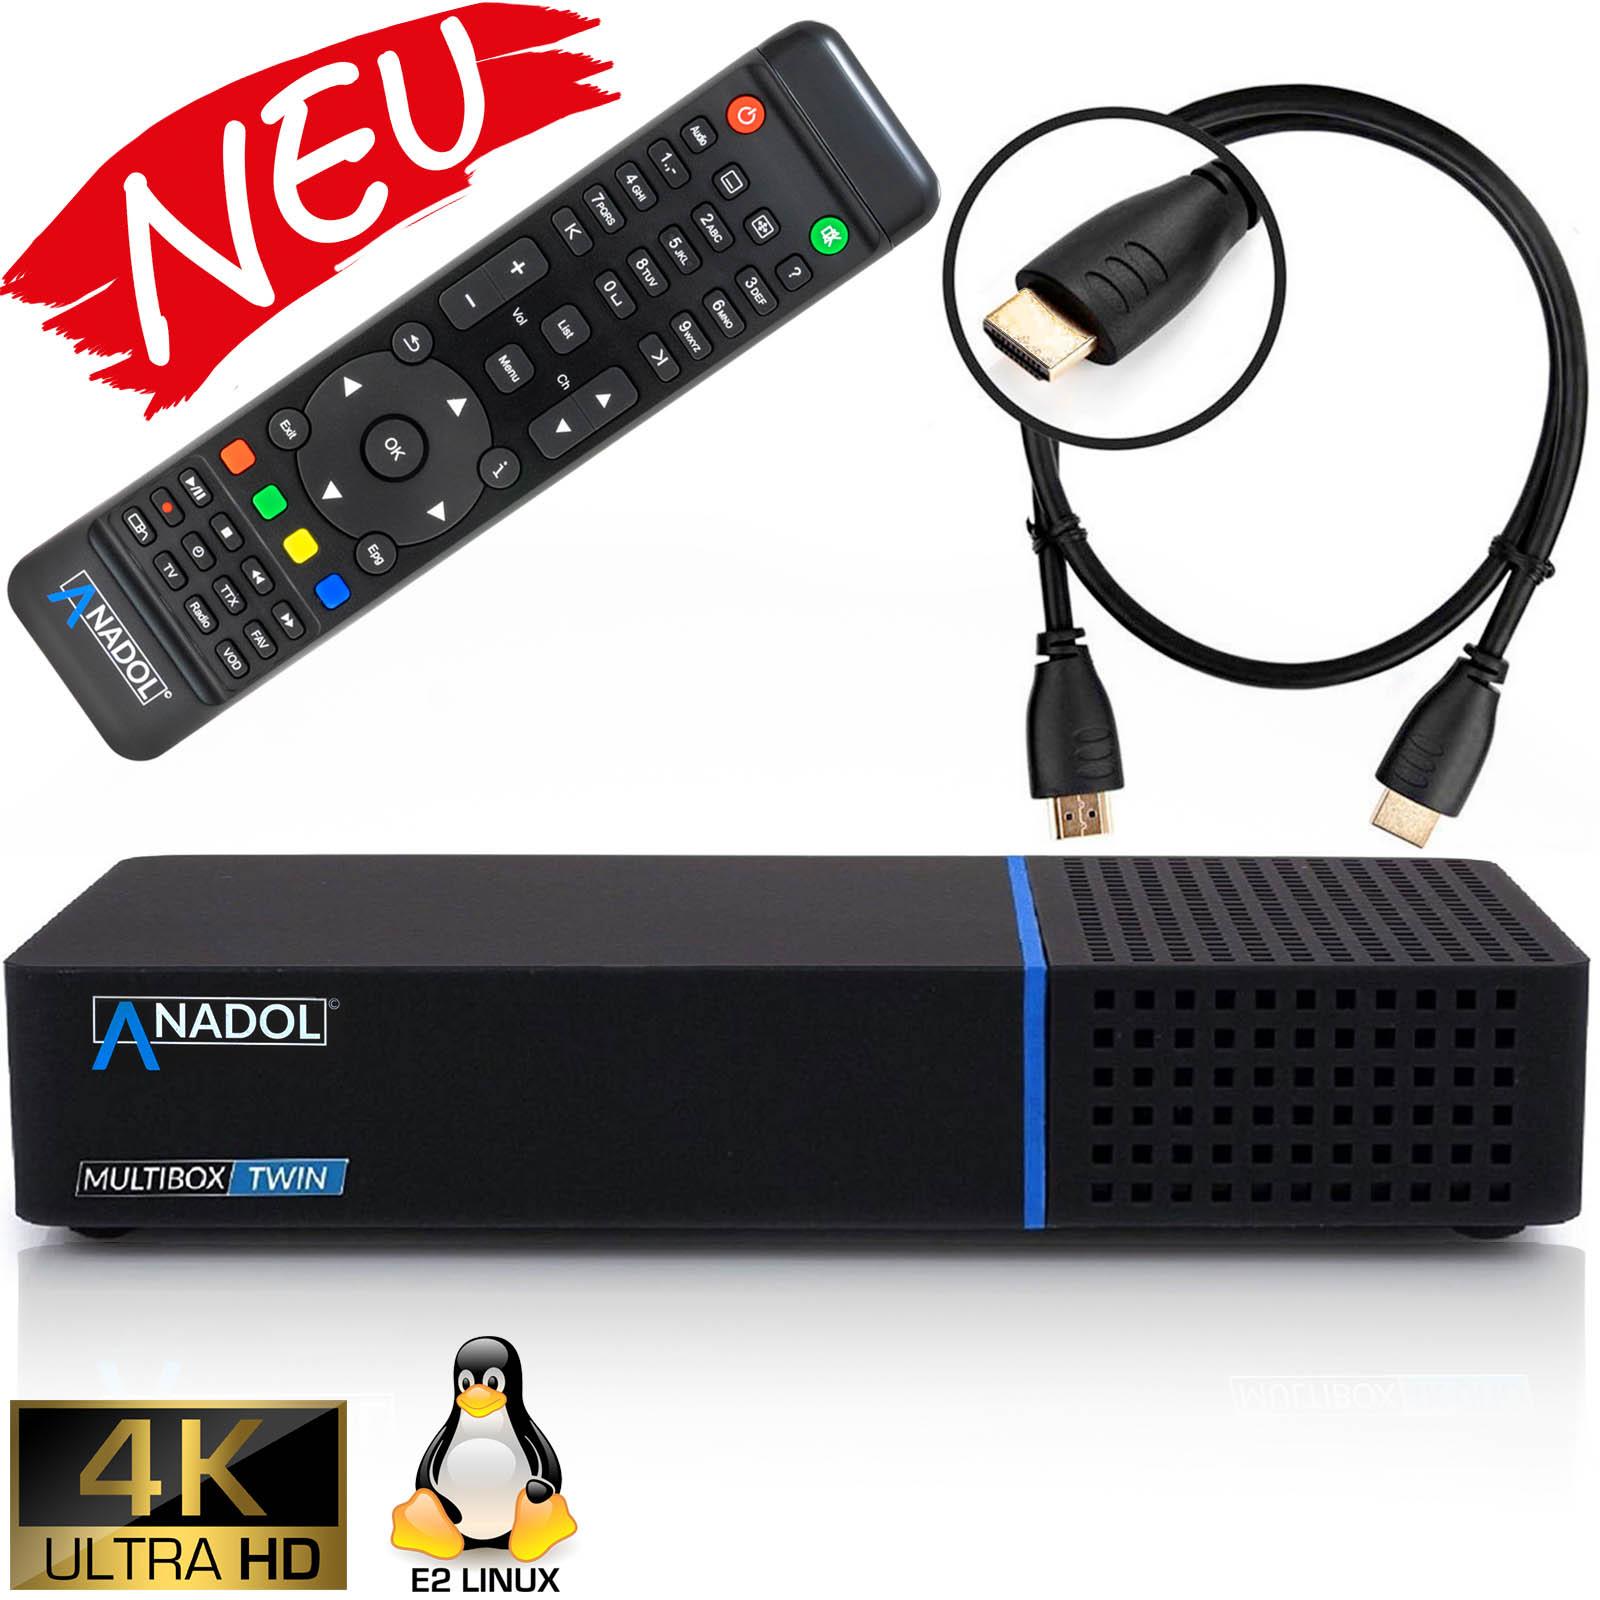 Anadol Multibox Twin  4K UHD E2 Linux Twin Sat-Receiver